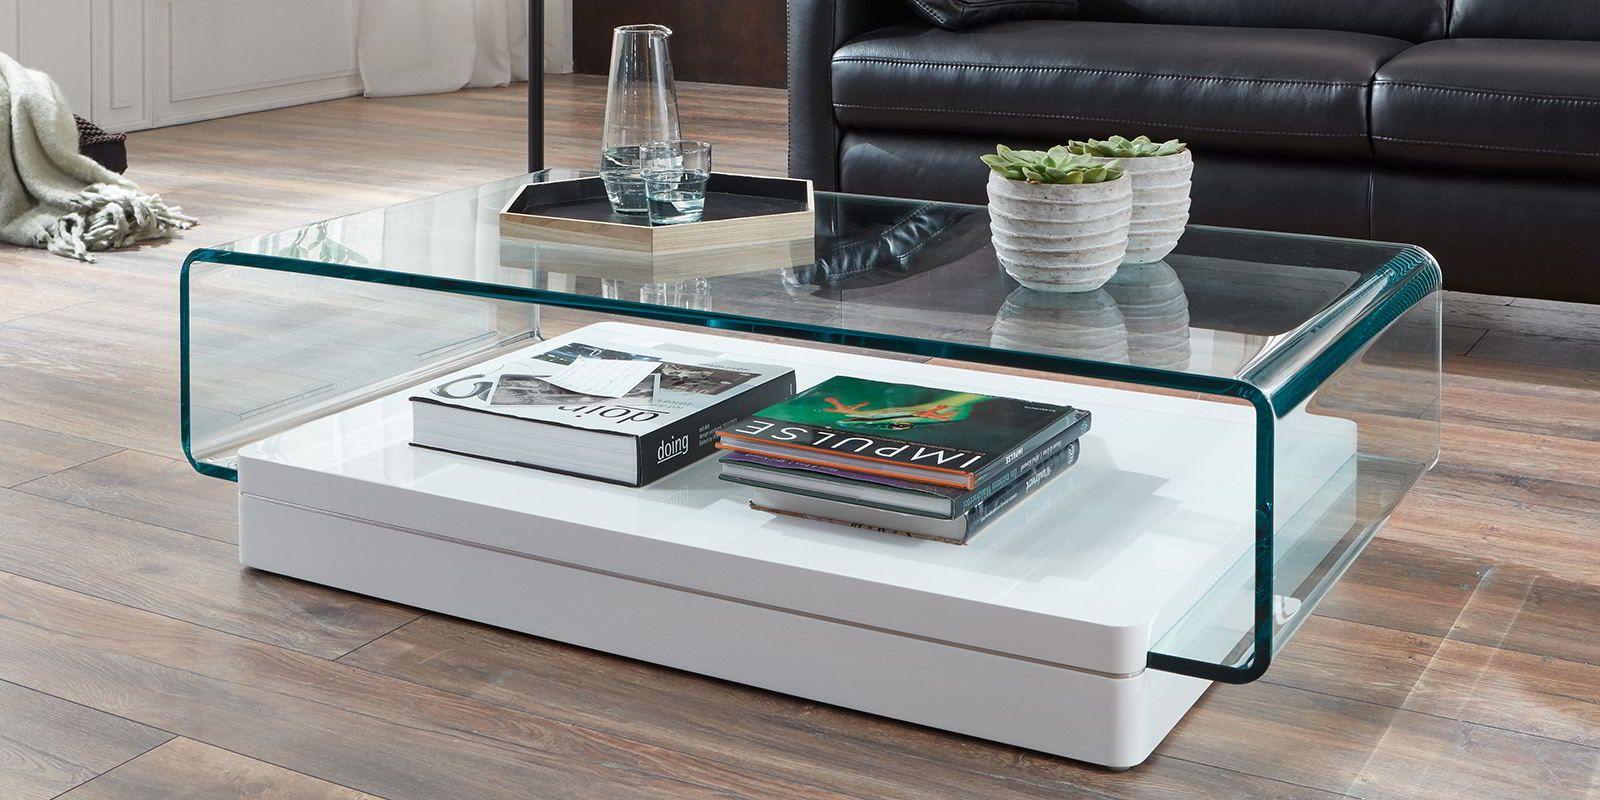 Designer Couchtisch Jura Glastisch Klarglas Comfort2home